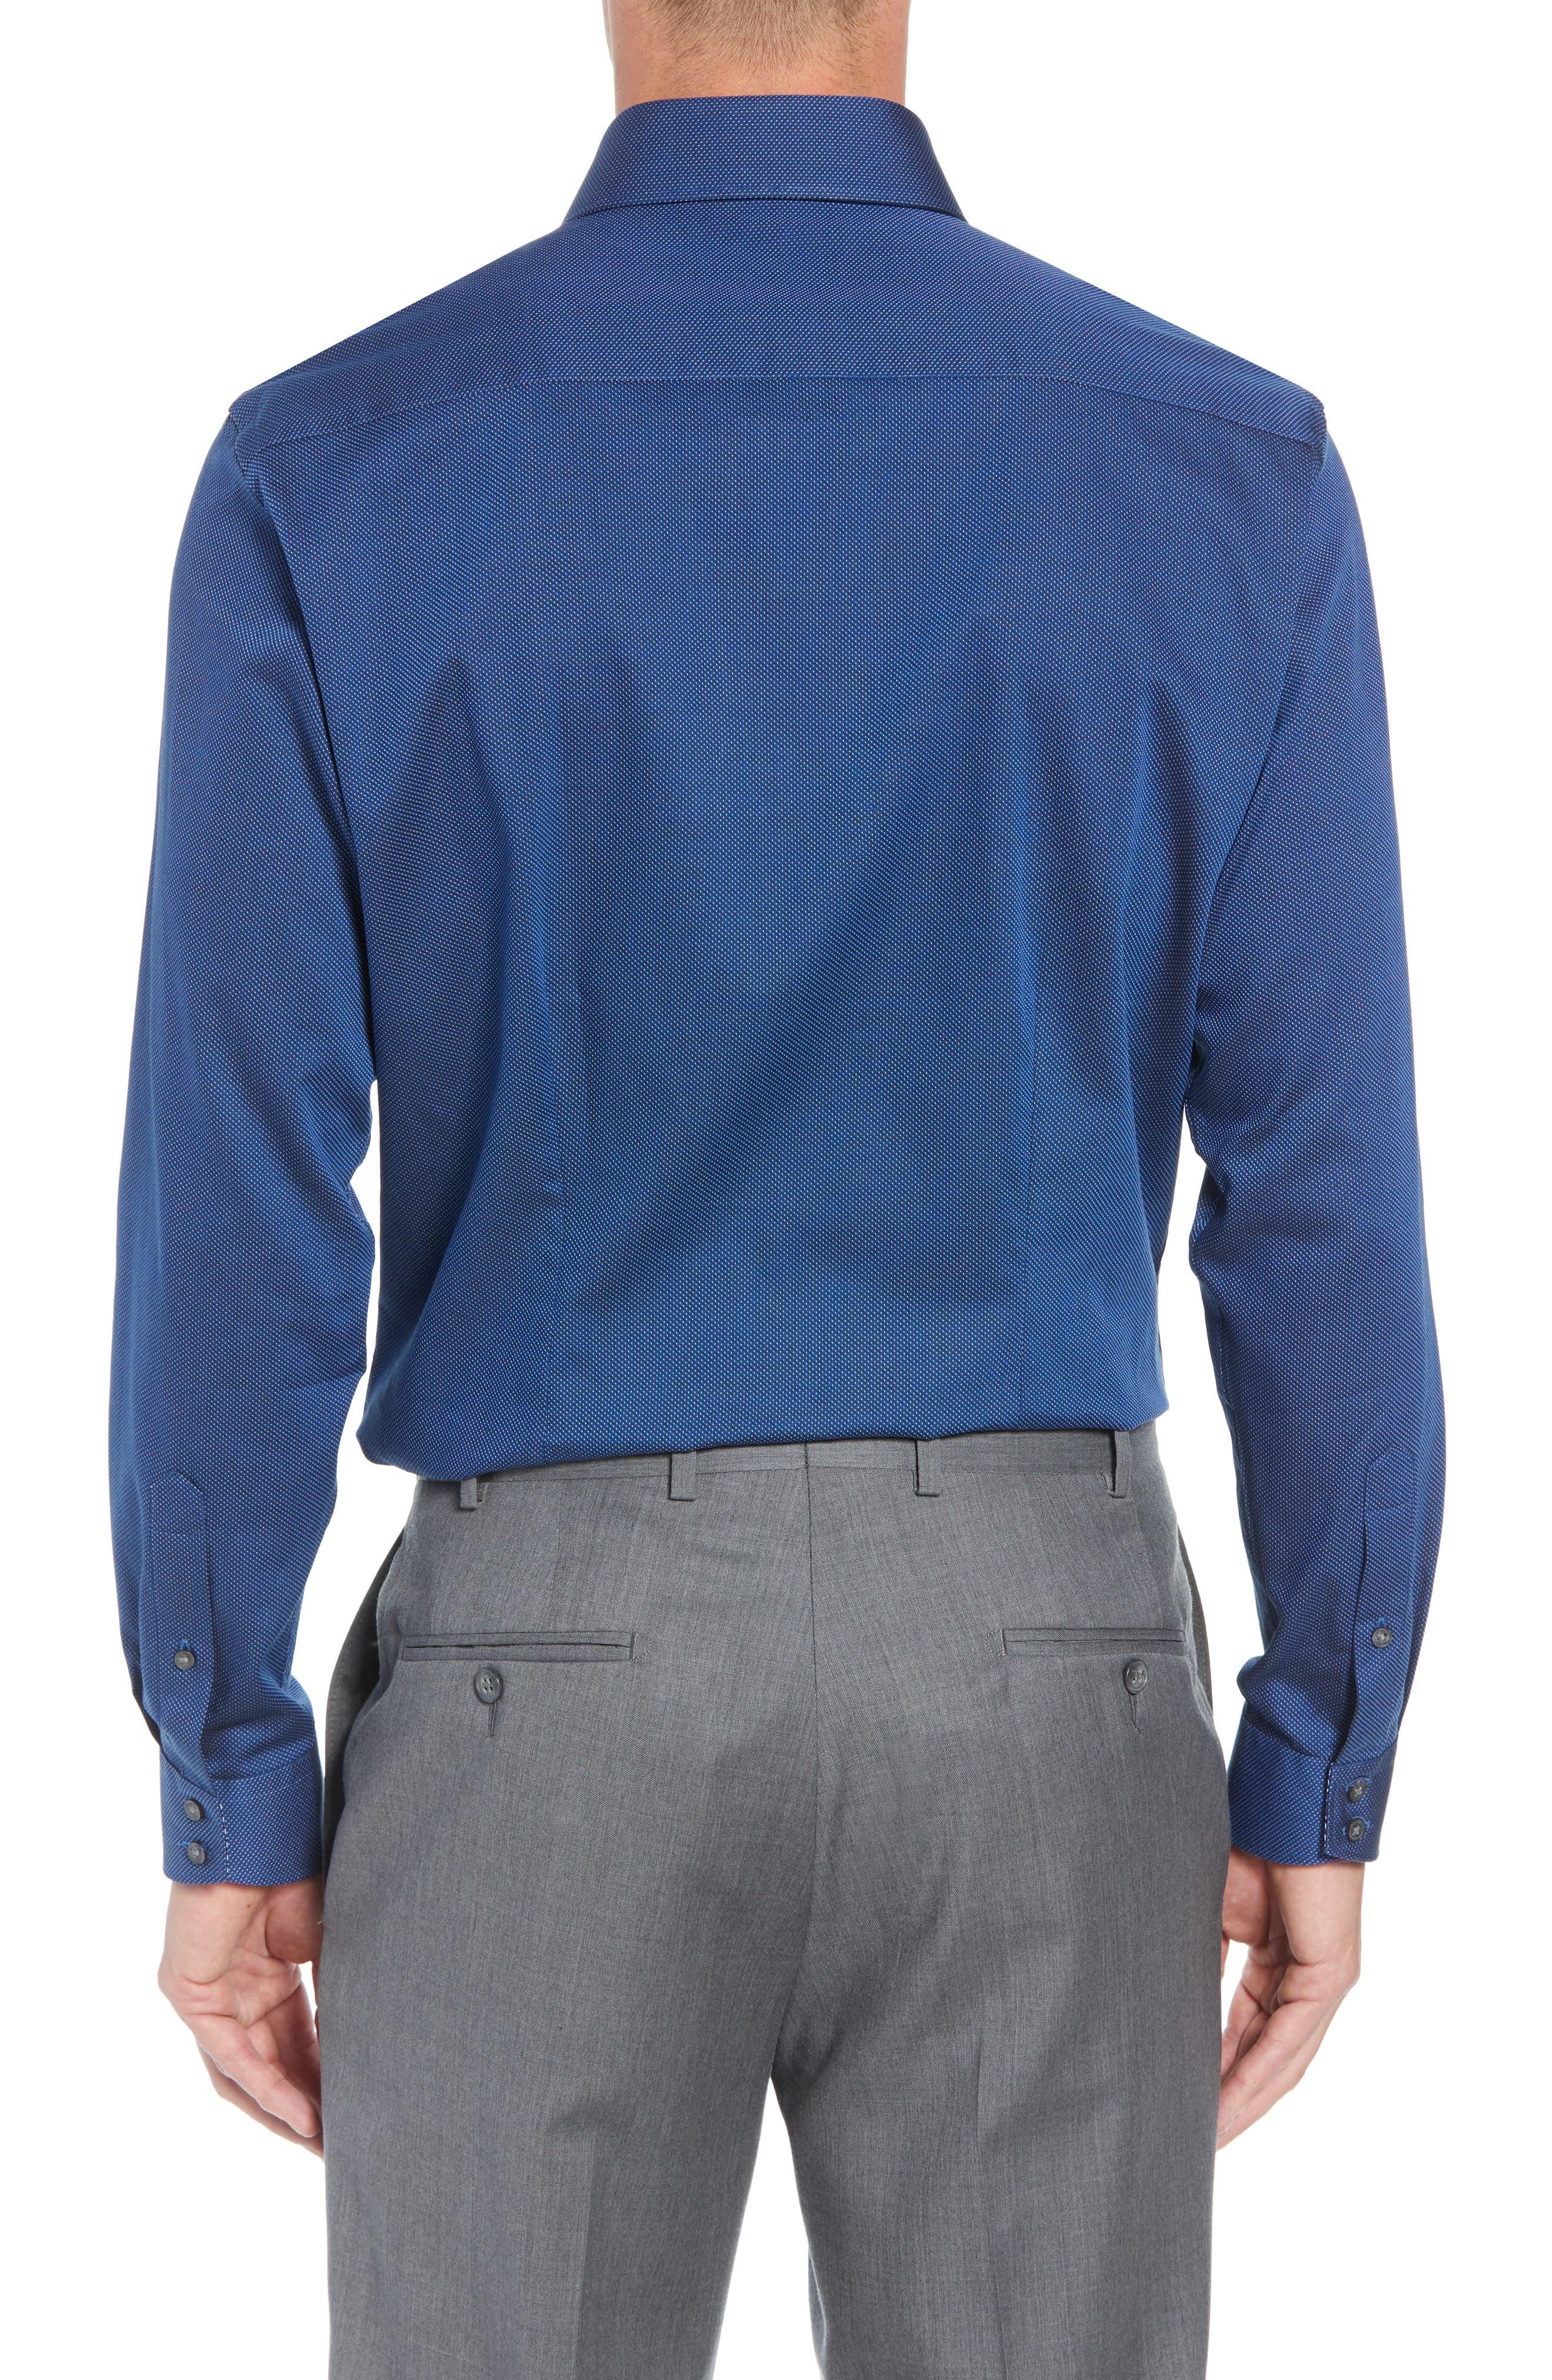 TED BAKER LONDON,                             Wikks Slim Fit Print Dress Shirt,                             Alternate thumbnail 3, color,                             410